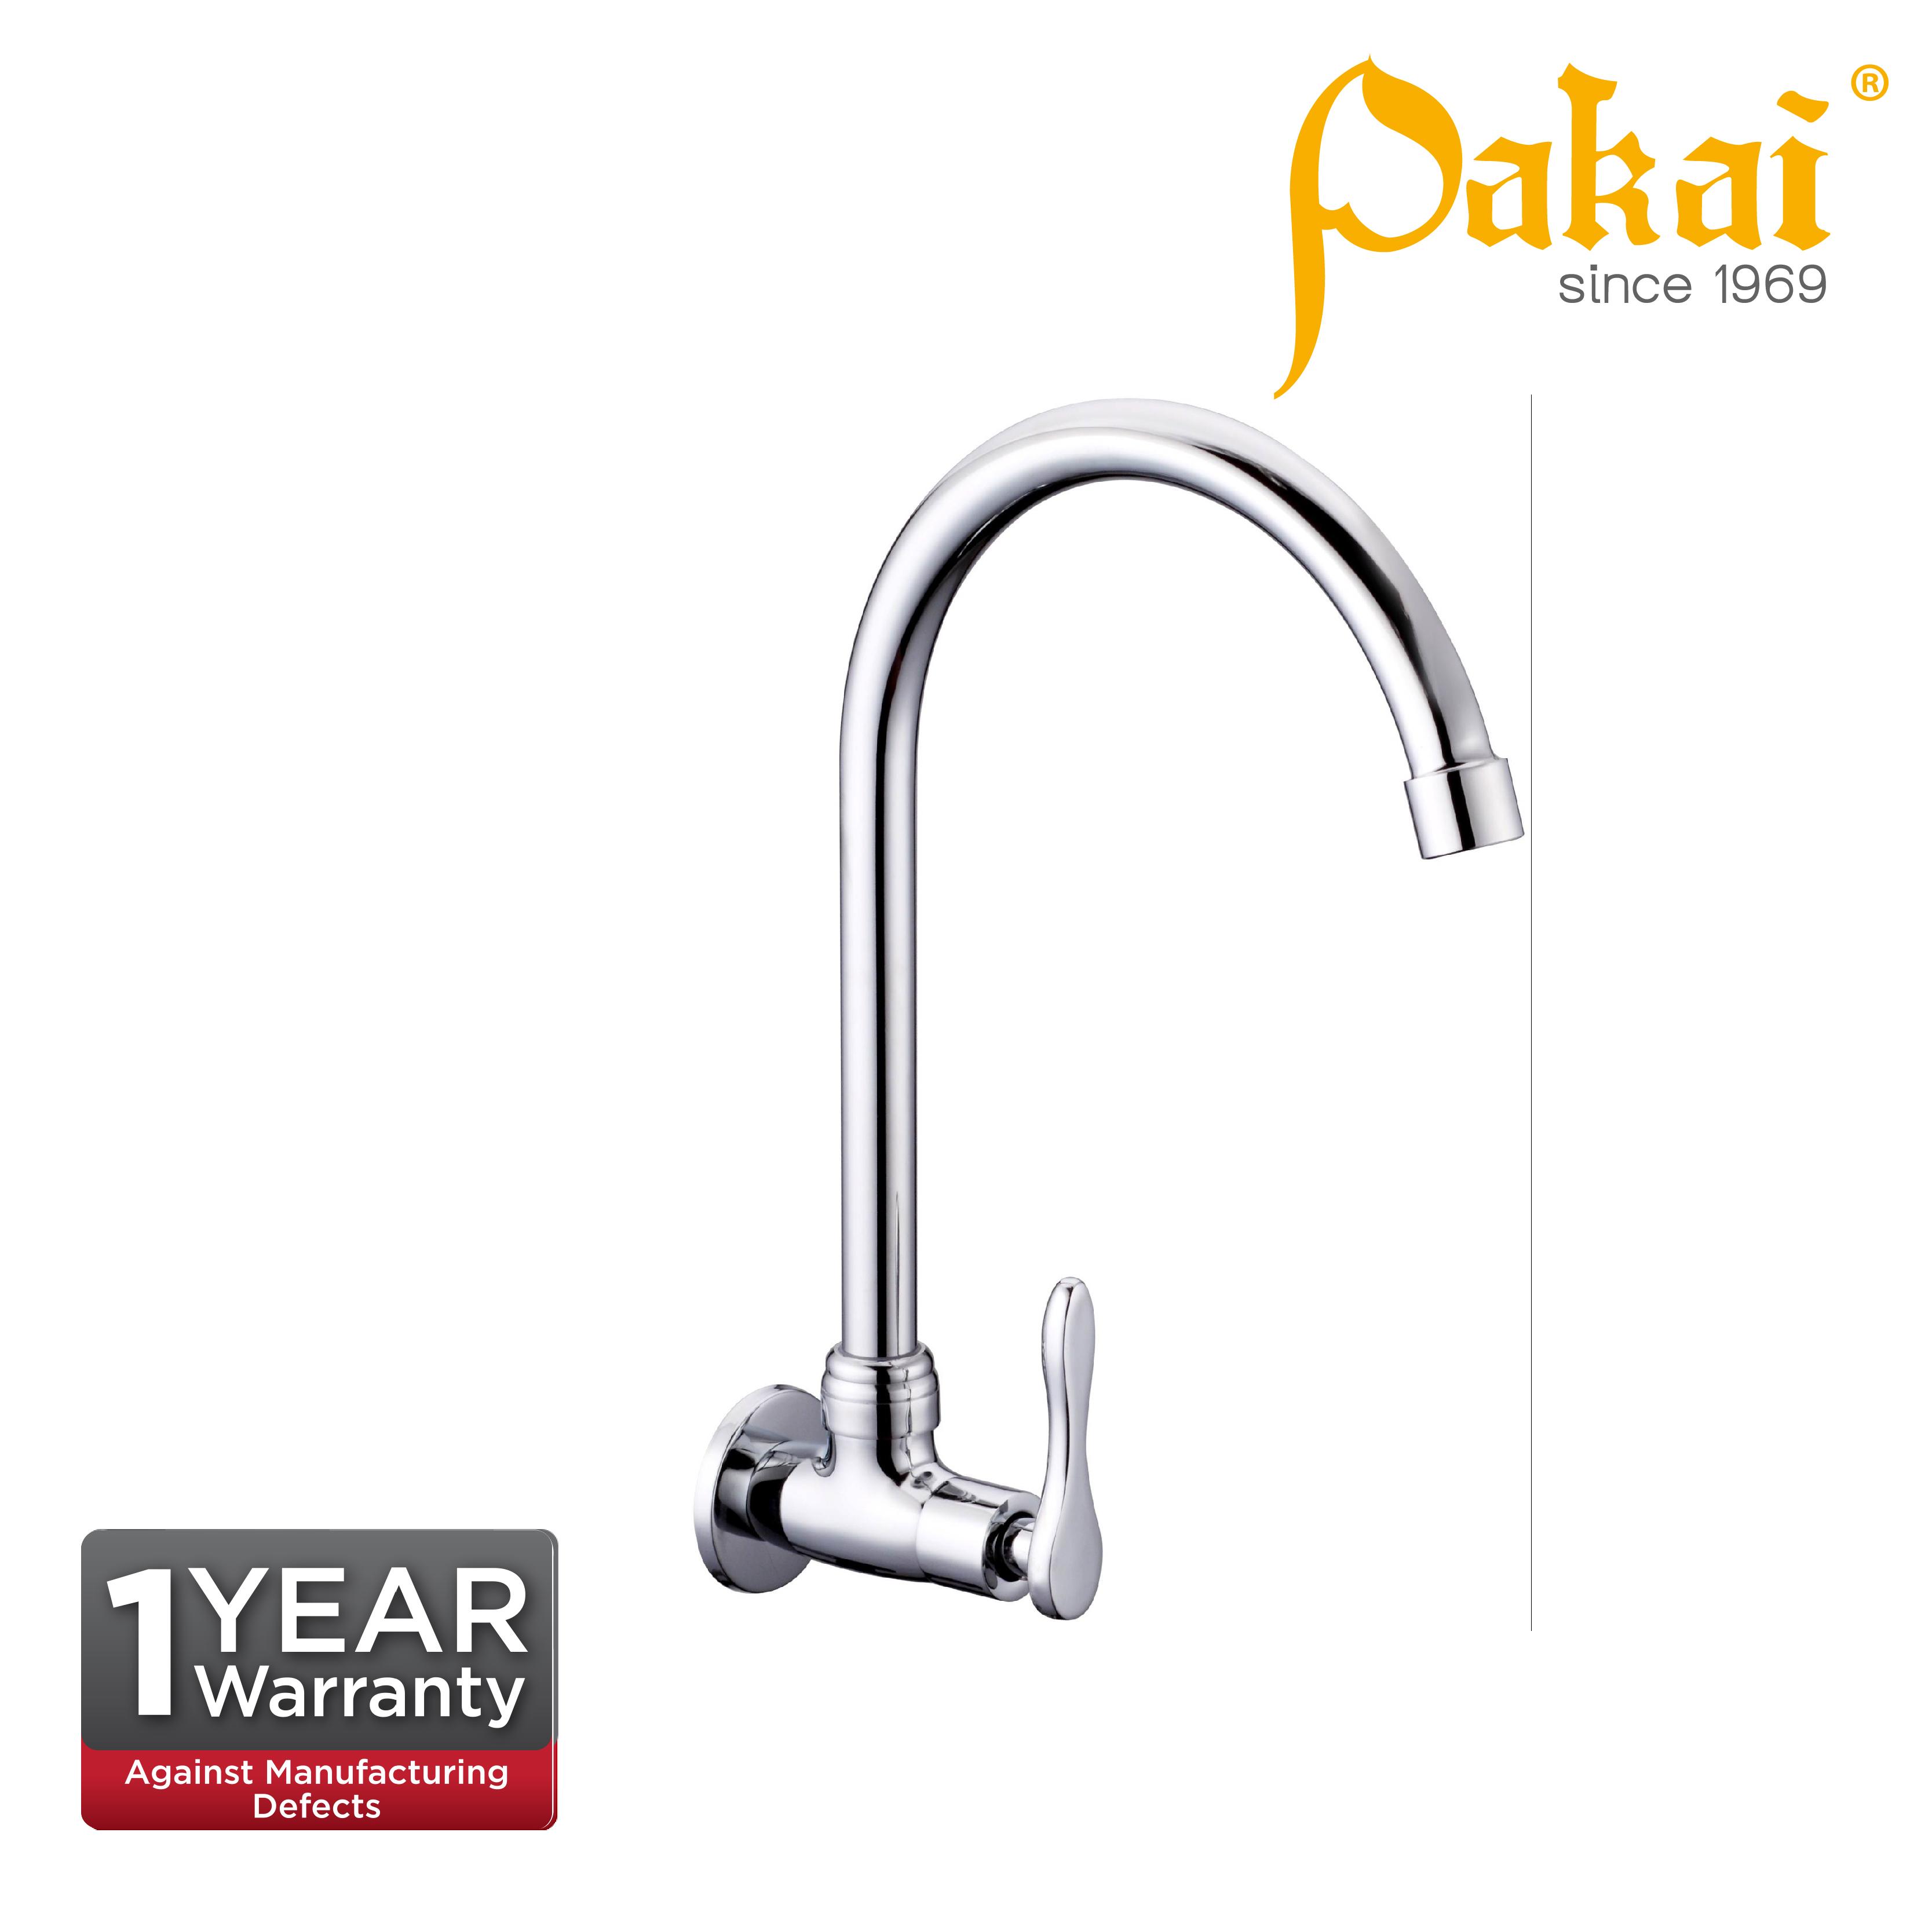 Pakai Wall Sink Tap Curve Series CV51000H